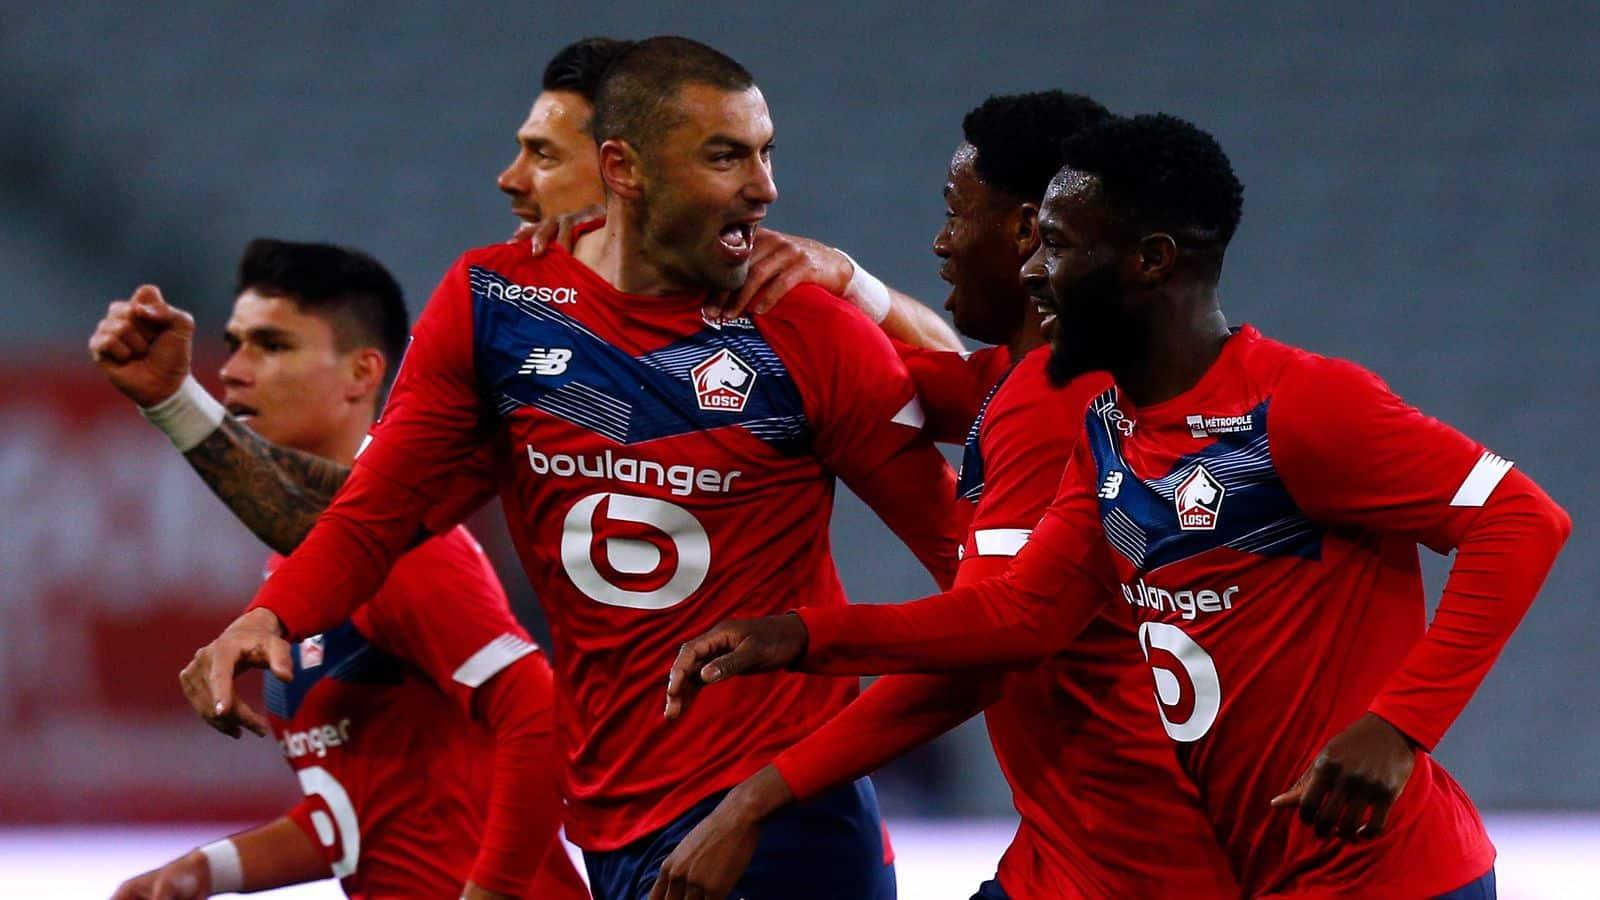 Ponturi pariuri Saint Etienne vs Lille